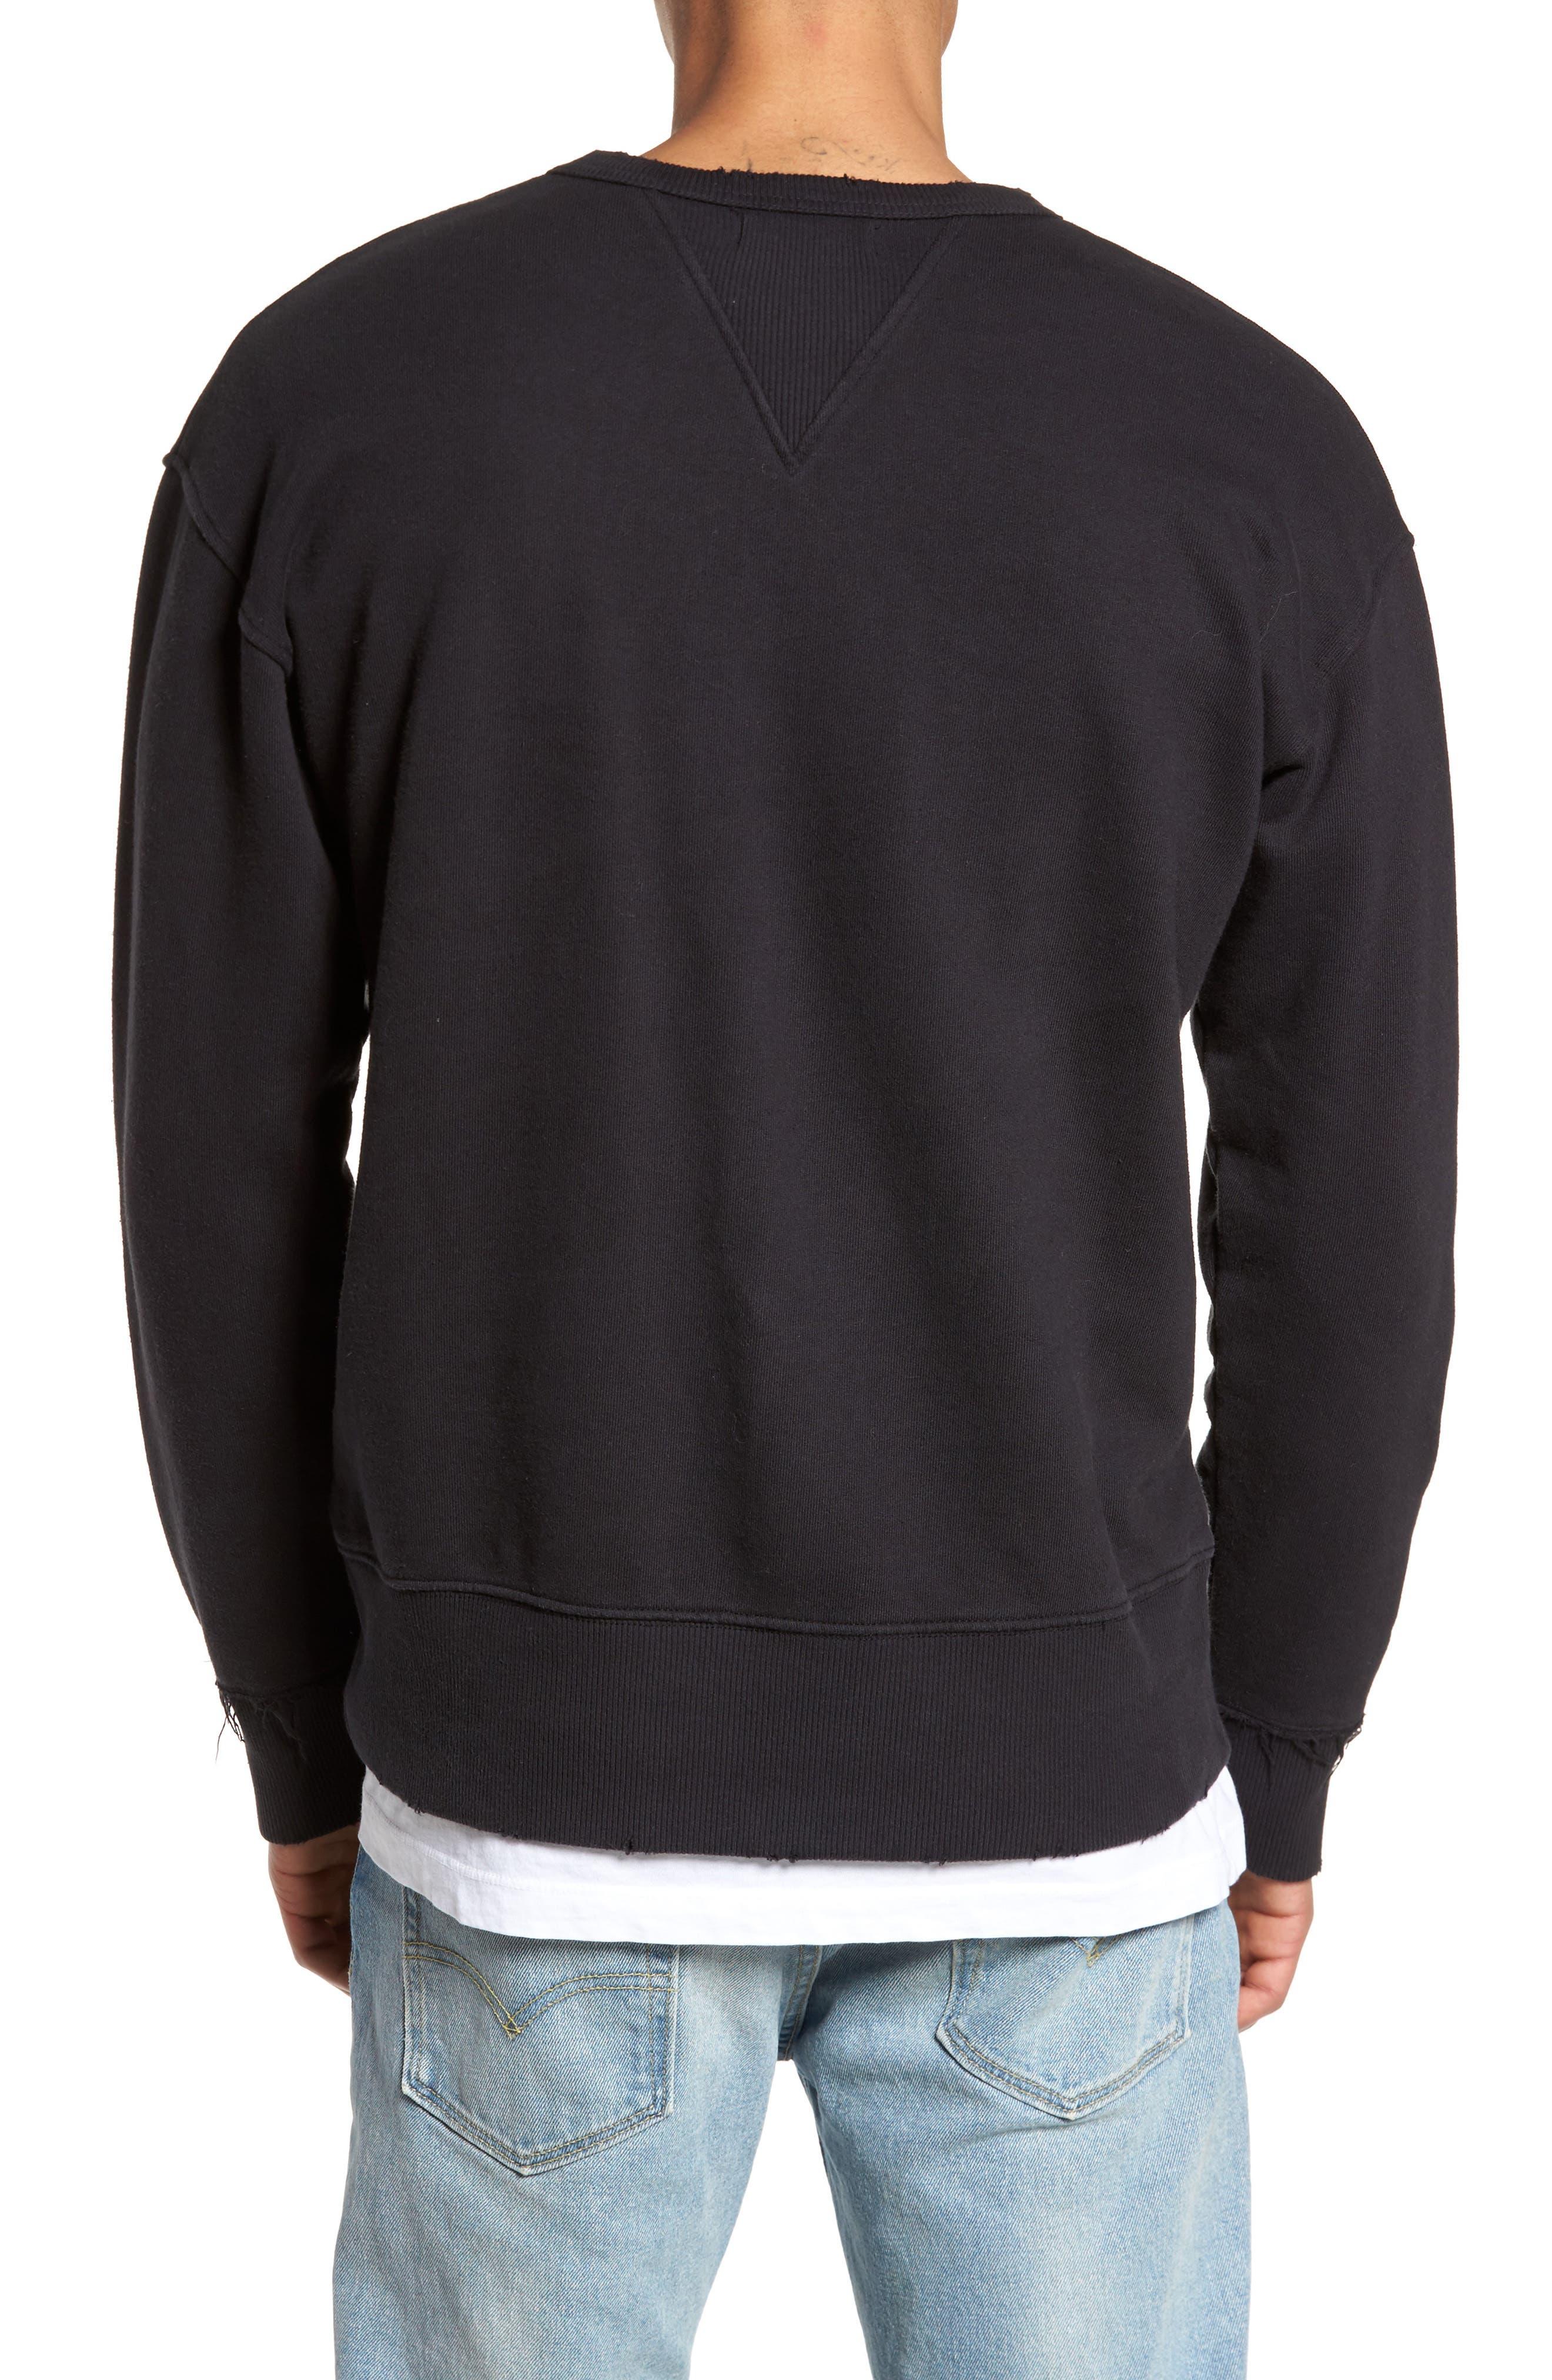 Distressed Sweatshirt,                             Alternate thumbnail 2, color,                             001